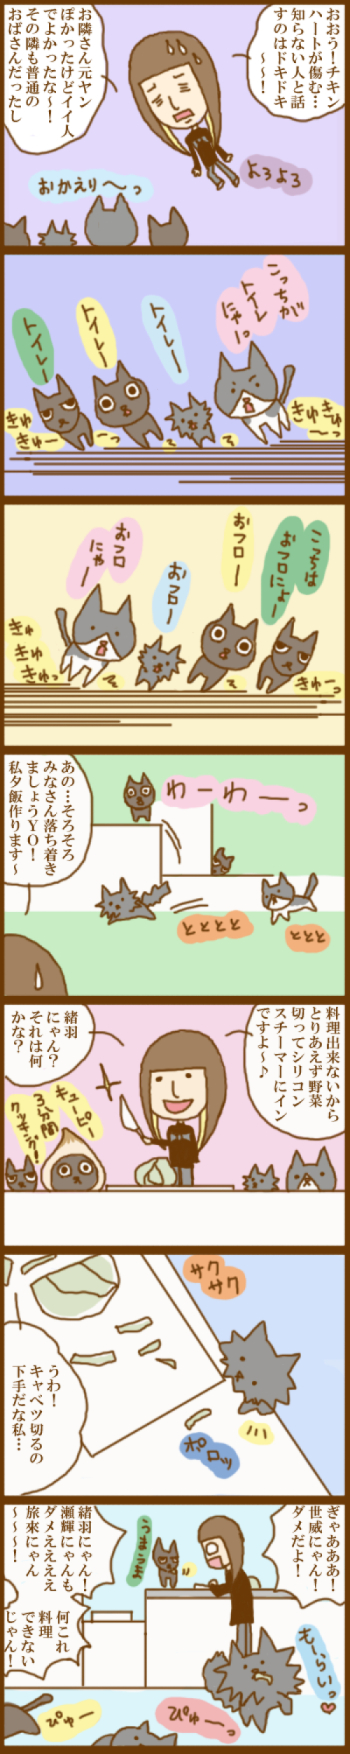 f:id:suzuokayu:20201117093625j:plain